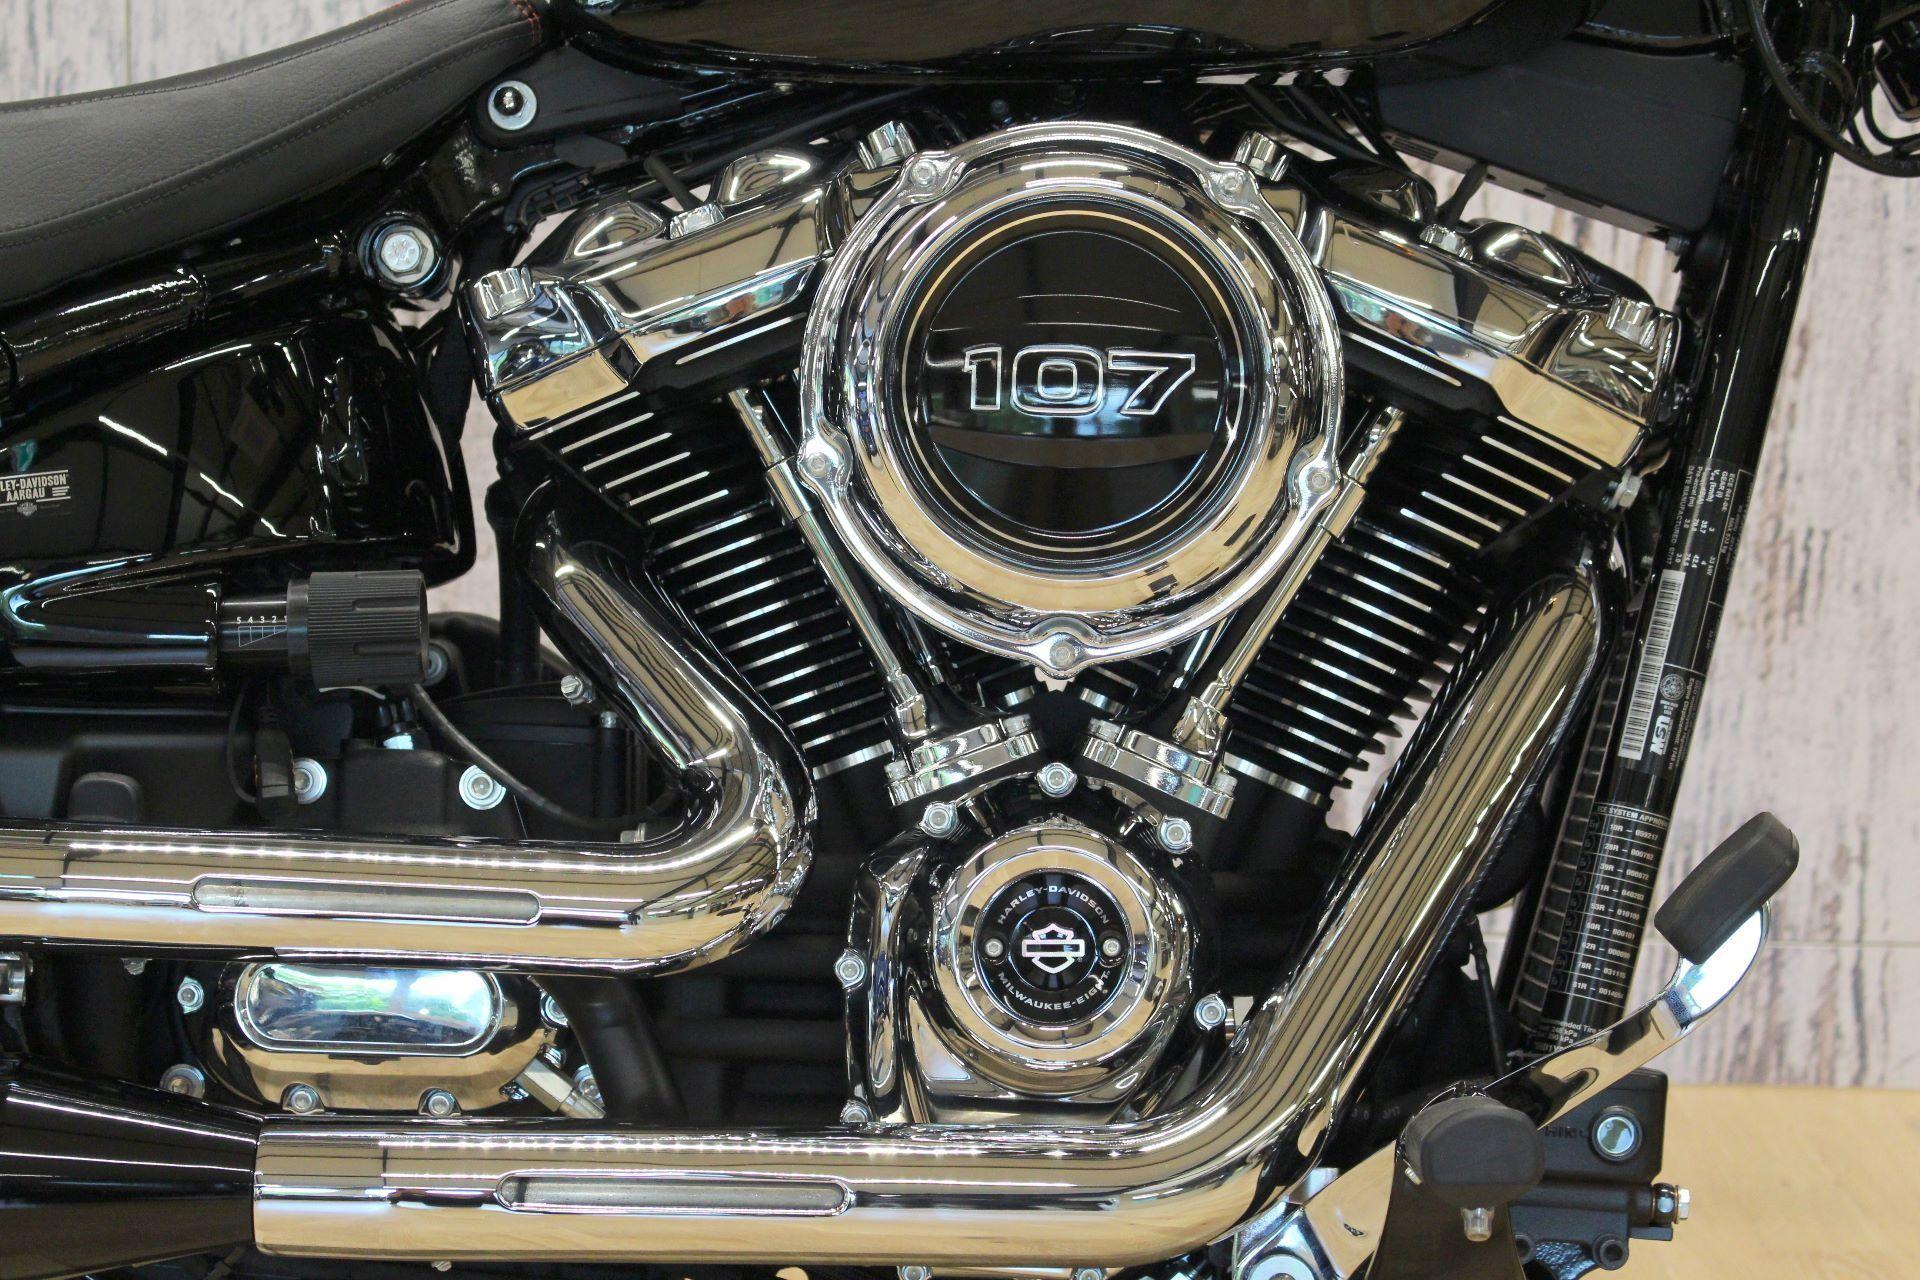 HARLEY-DAVIDSON FXBR 1745 Breakout 107 Model 2018 Harley ...